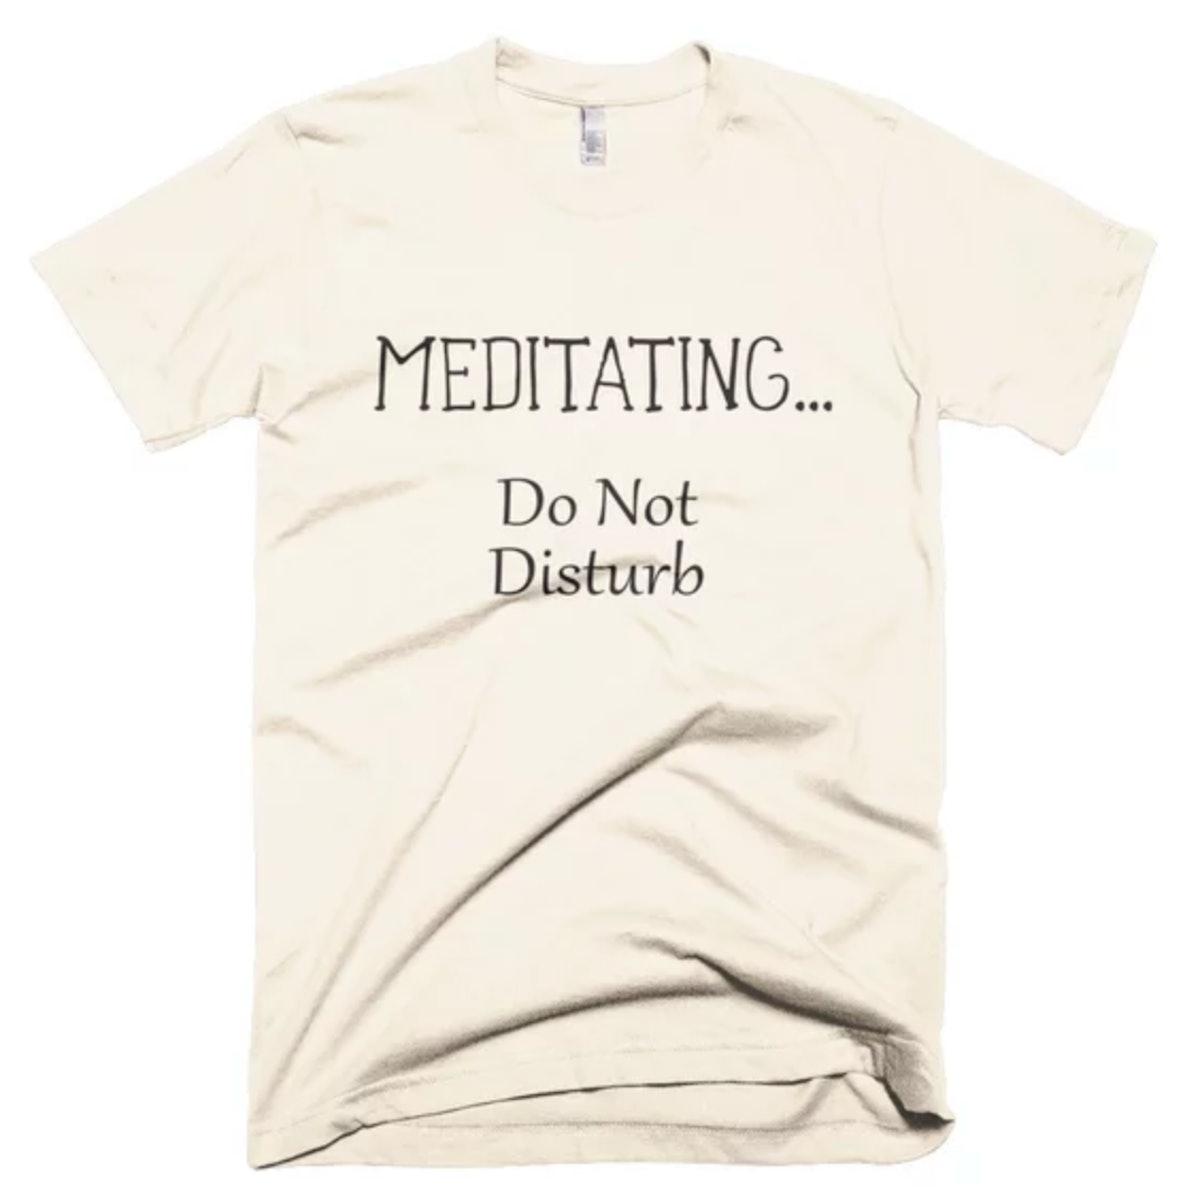 Meditating, Do Not Disturb T-Shirt